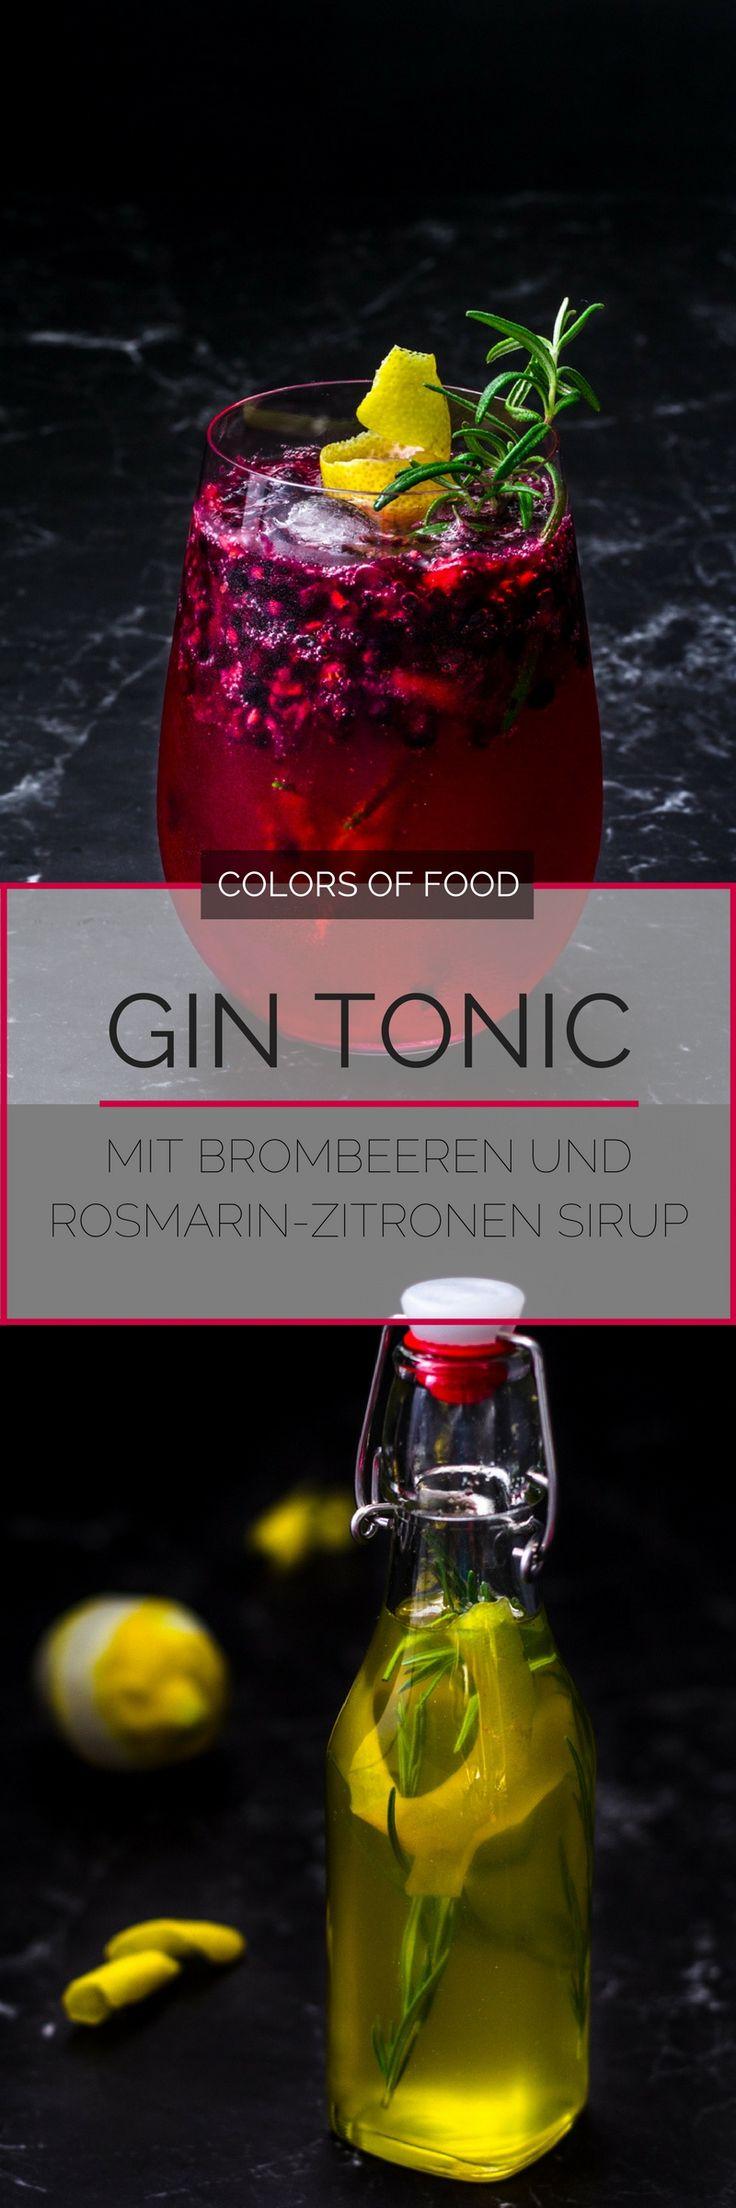 Gin Tonic mit Brombeere und Rosmarin-Zitronen Sirup – Colors of Food